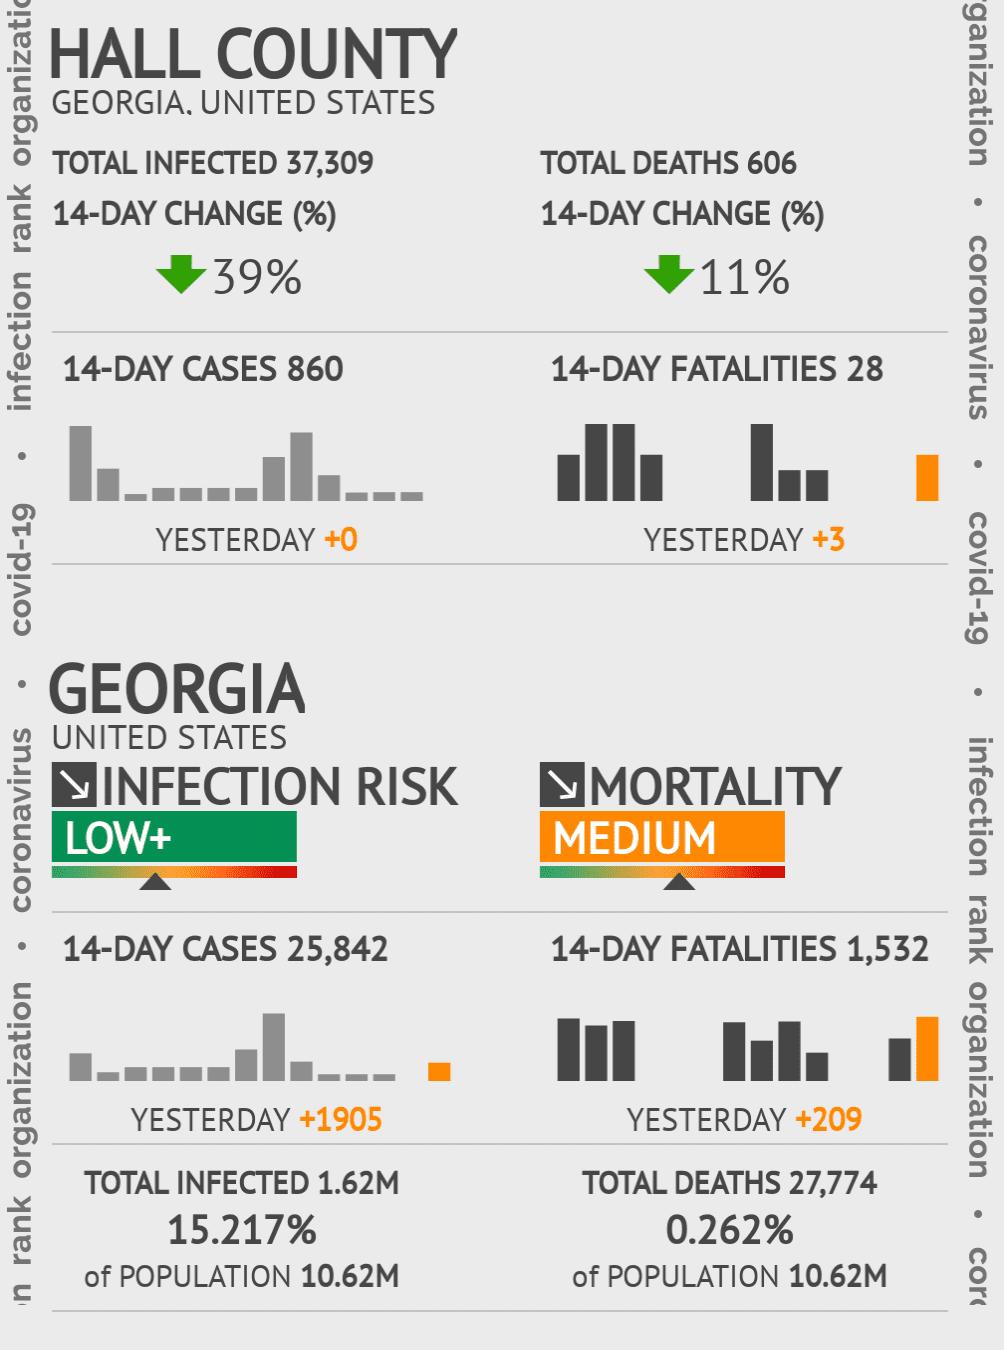 Hall County Coronavirus Covid-19 Risk of Infection on February 25, 2021